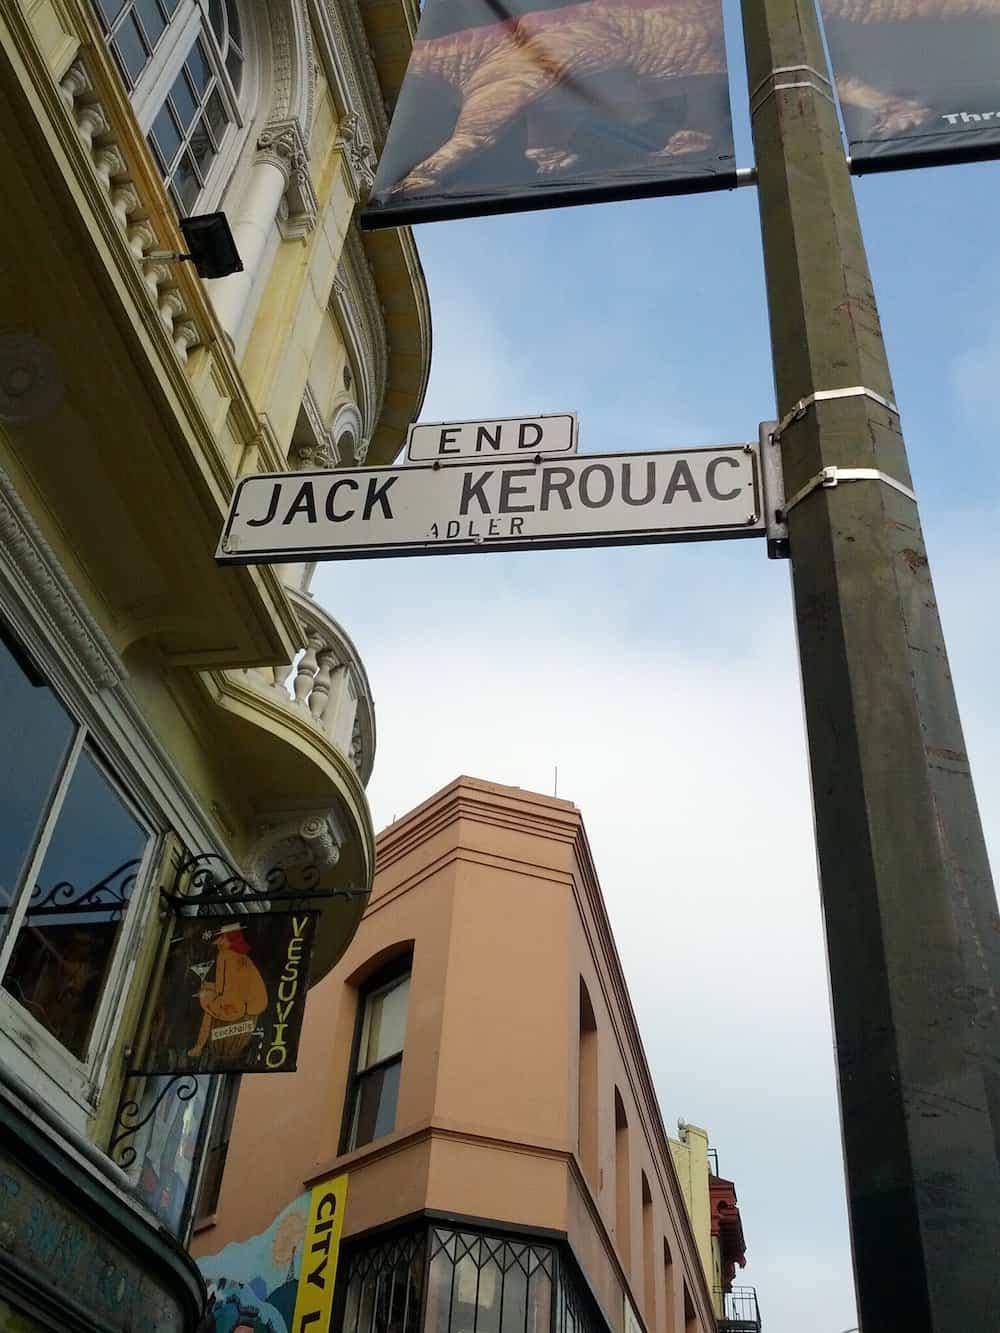 Jack Kerouac Alley sign